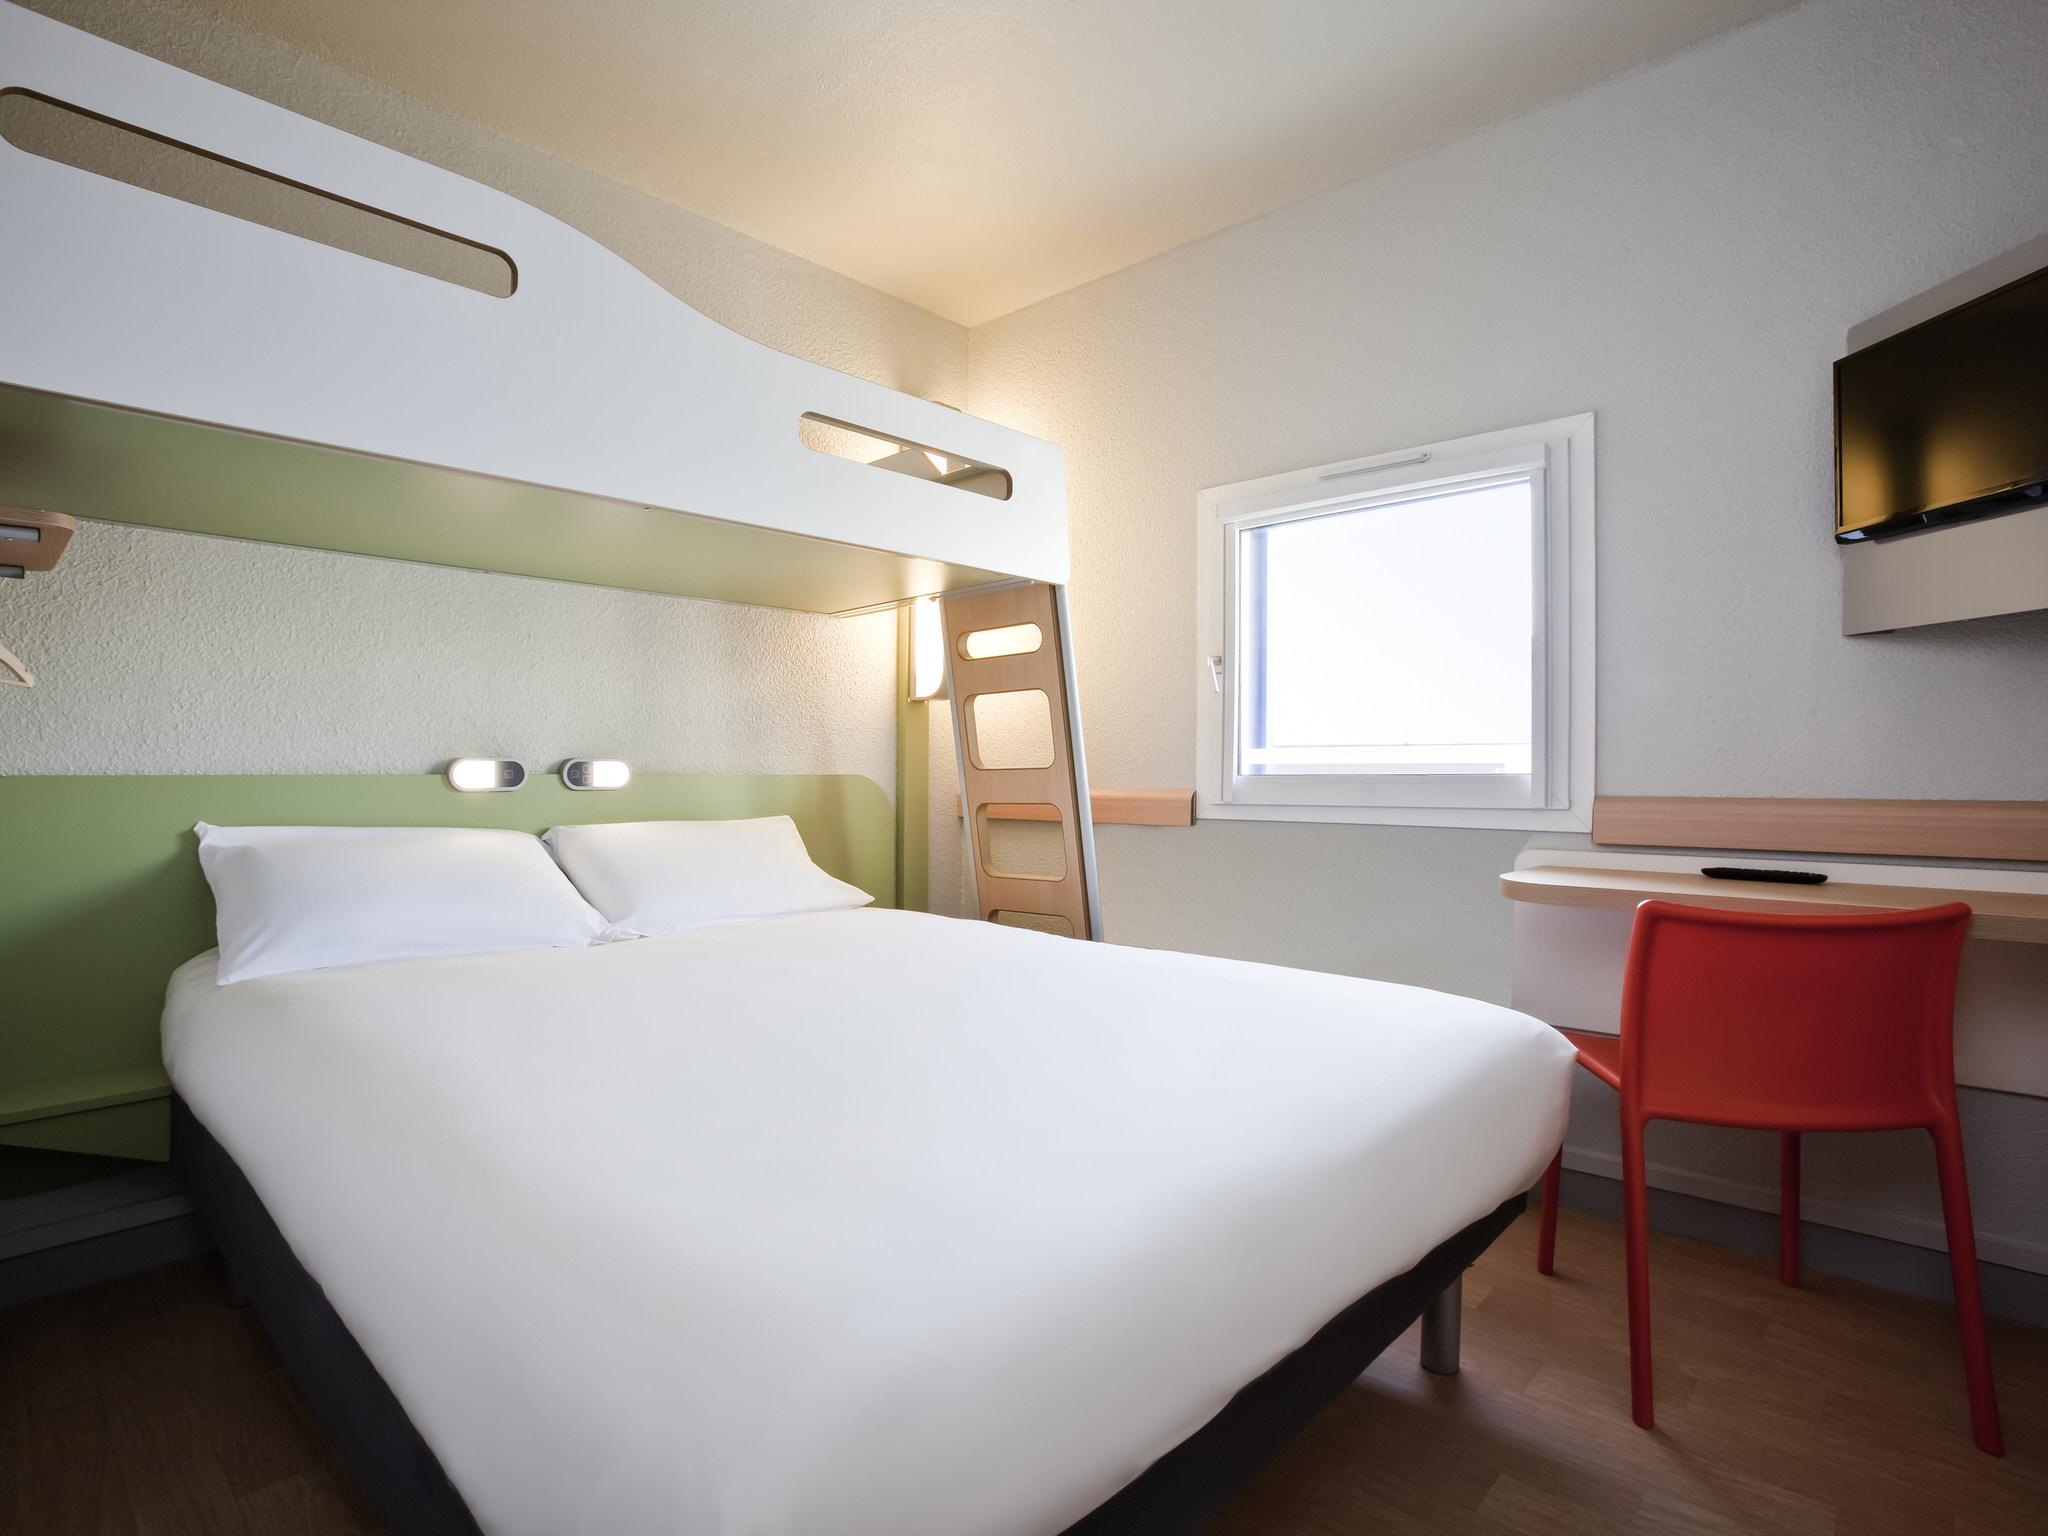 Hotel – ibis budget Pontault-Combault RN4 Marne-la-Vallée